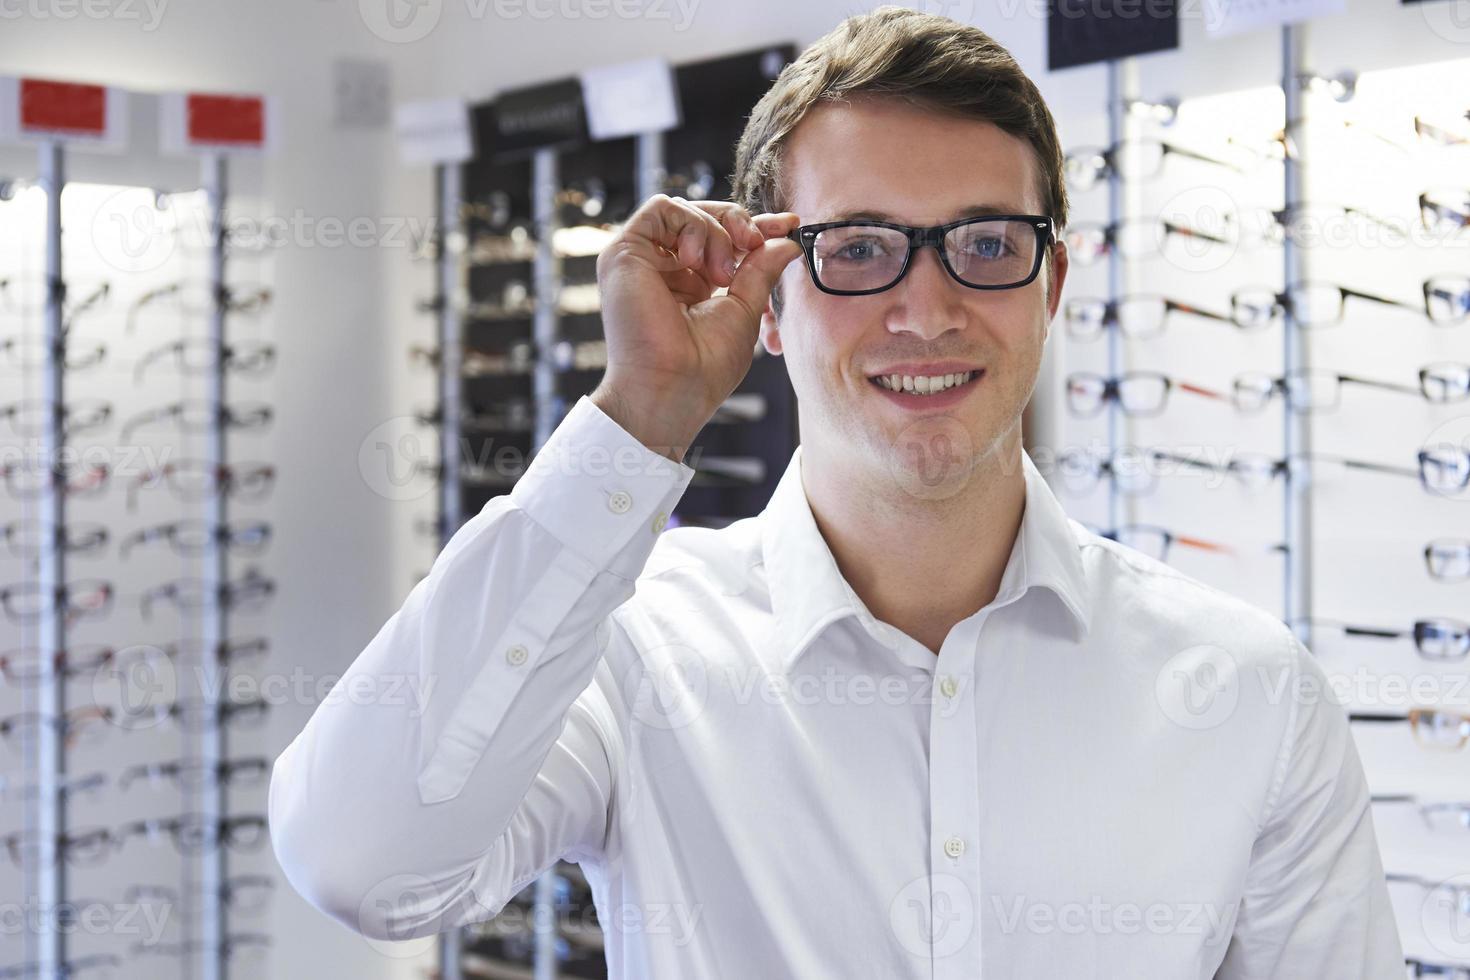 man kiezen nieuwe bril bij opticiens foto